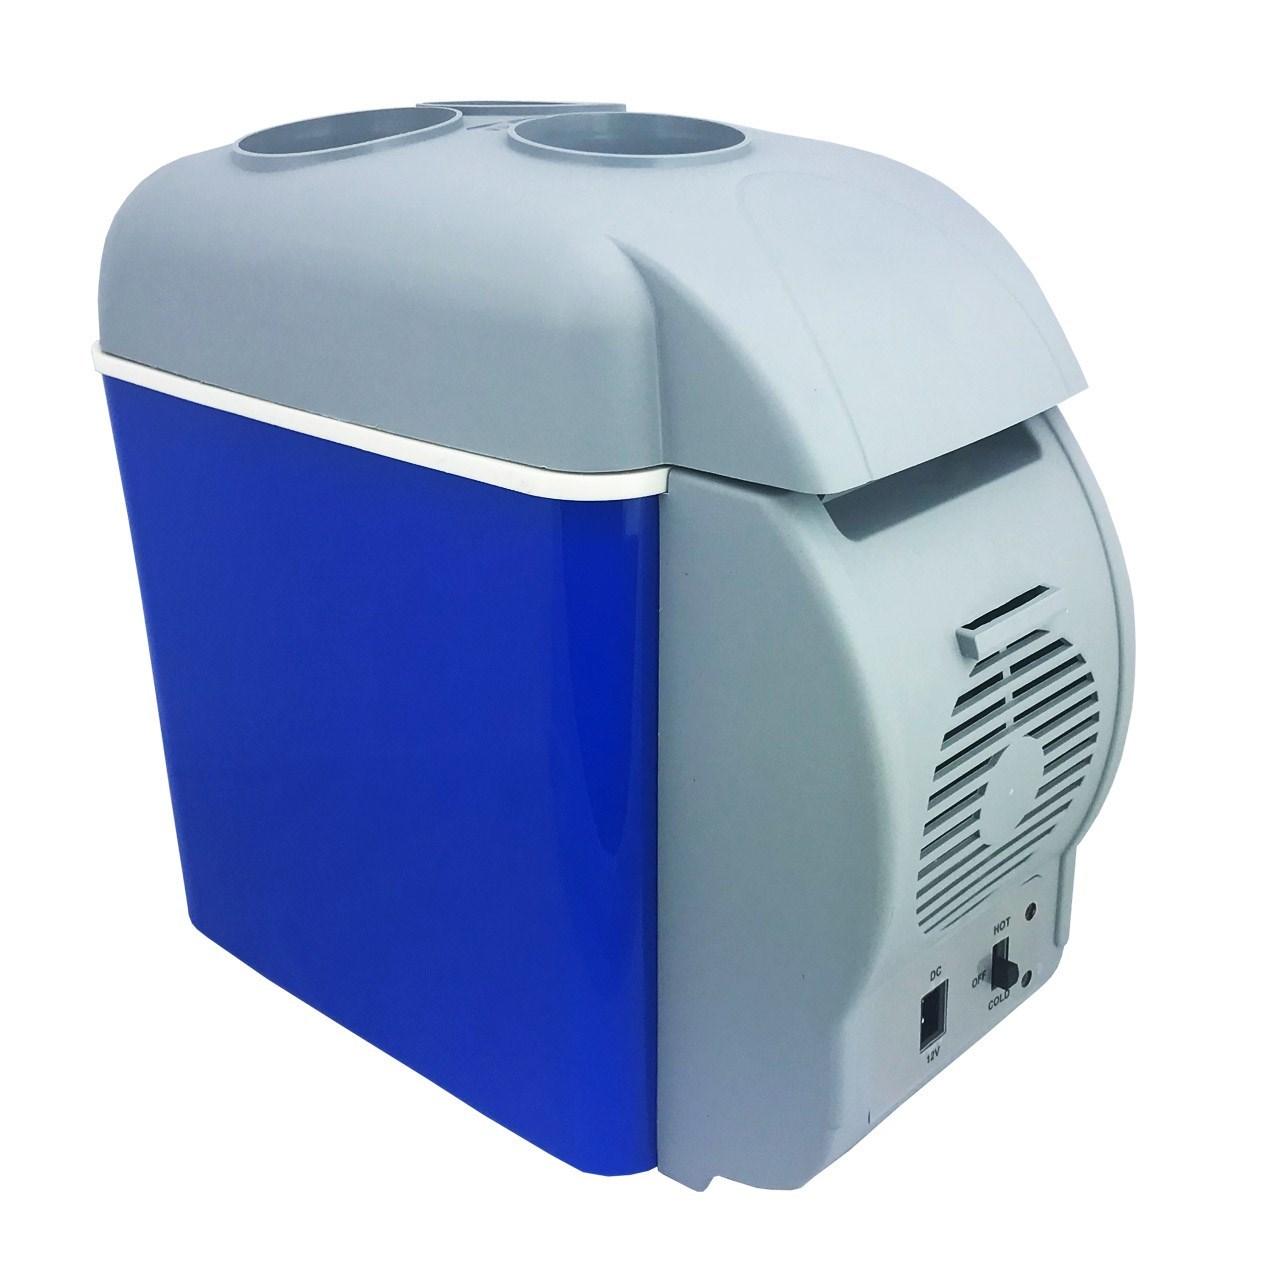 یخچال خودرو آتی انرژی مدل 7/5L